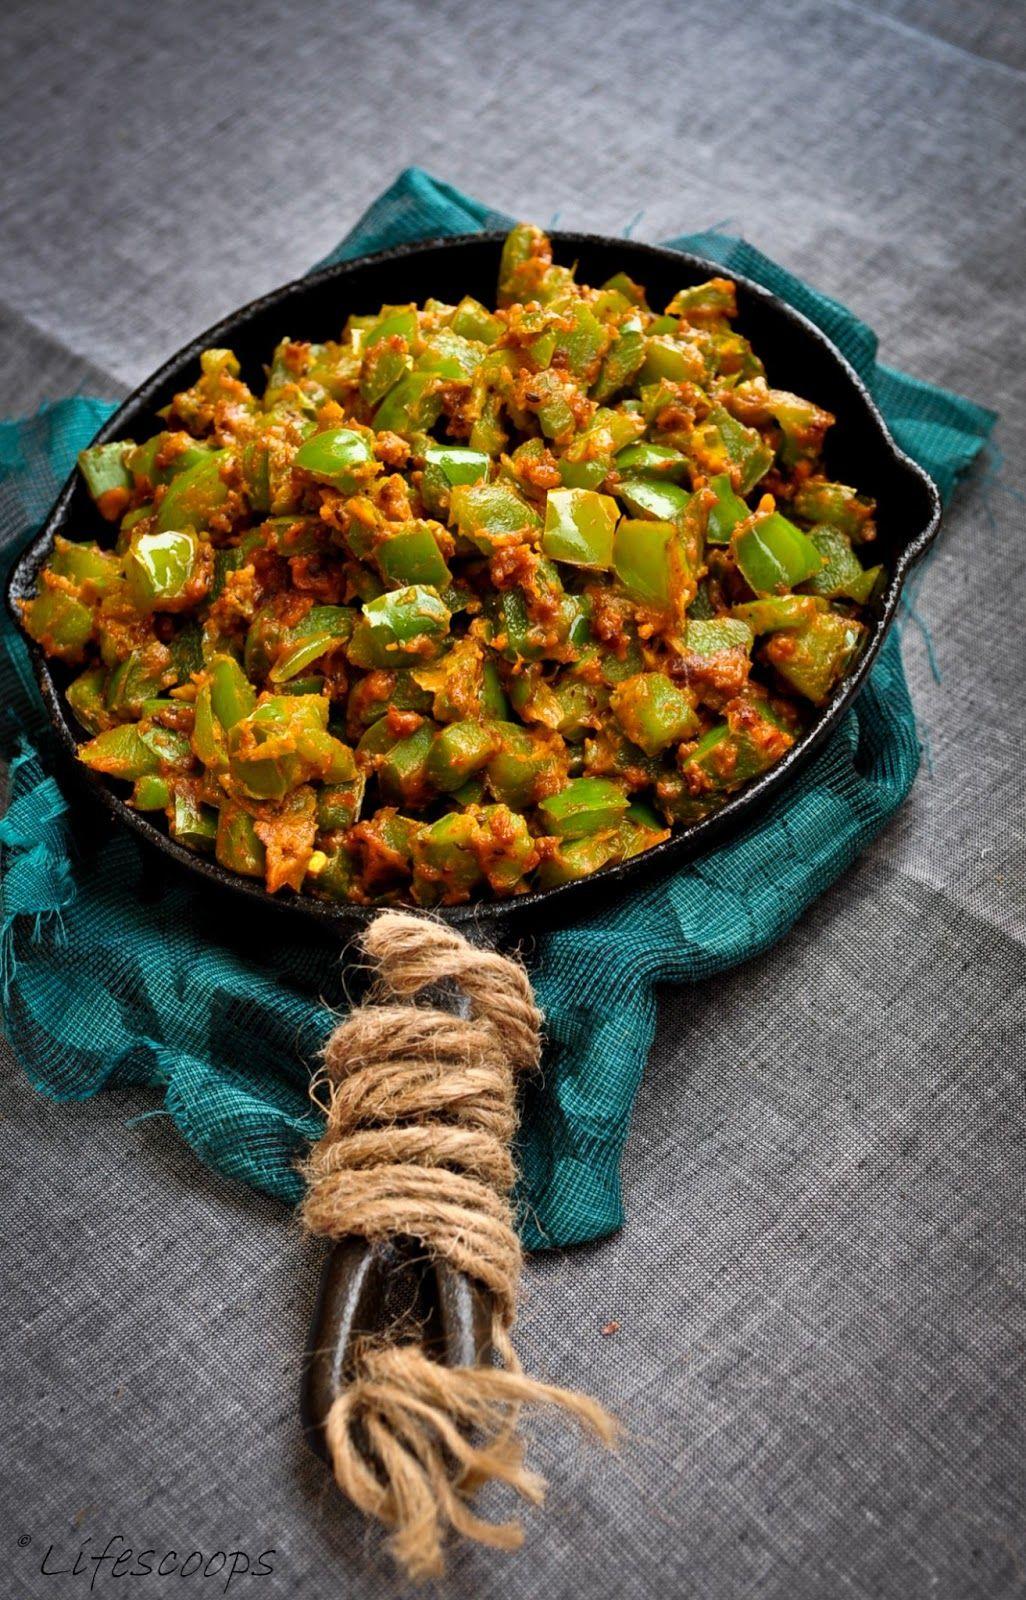 Green Bell Pepper with Chickpea Flour / Gujarati Capsicum